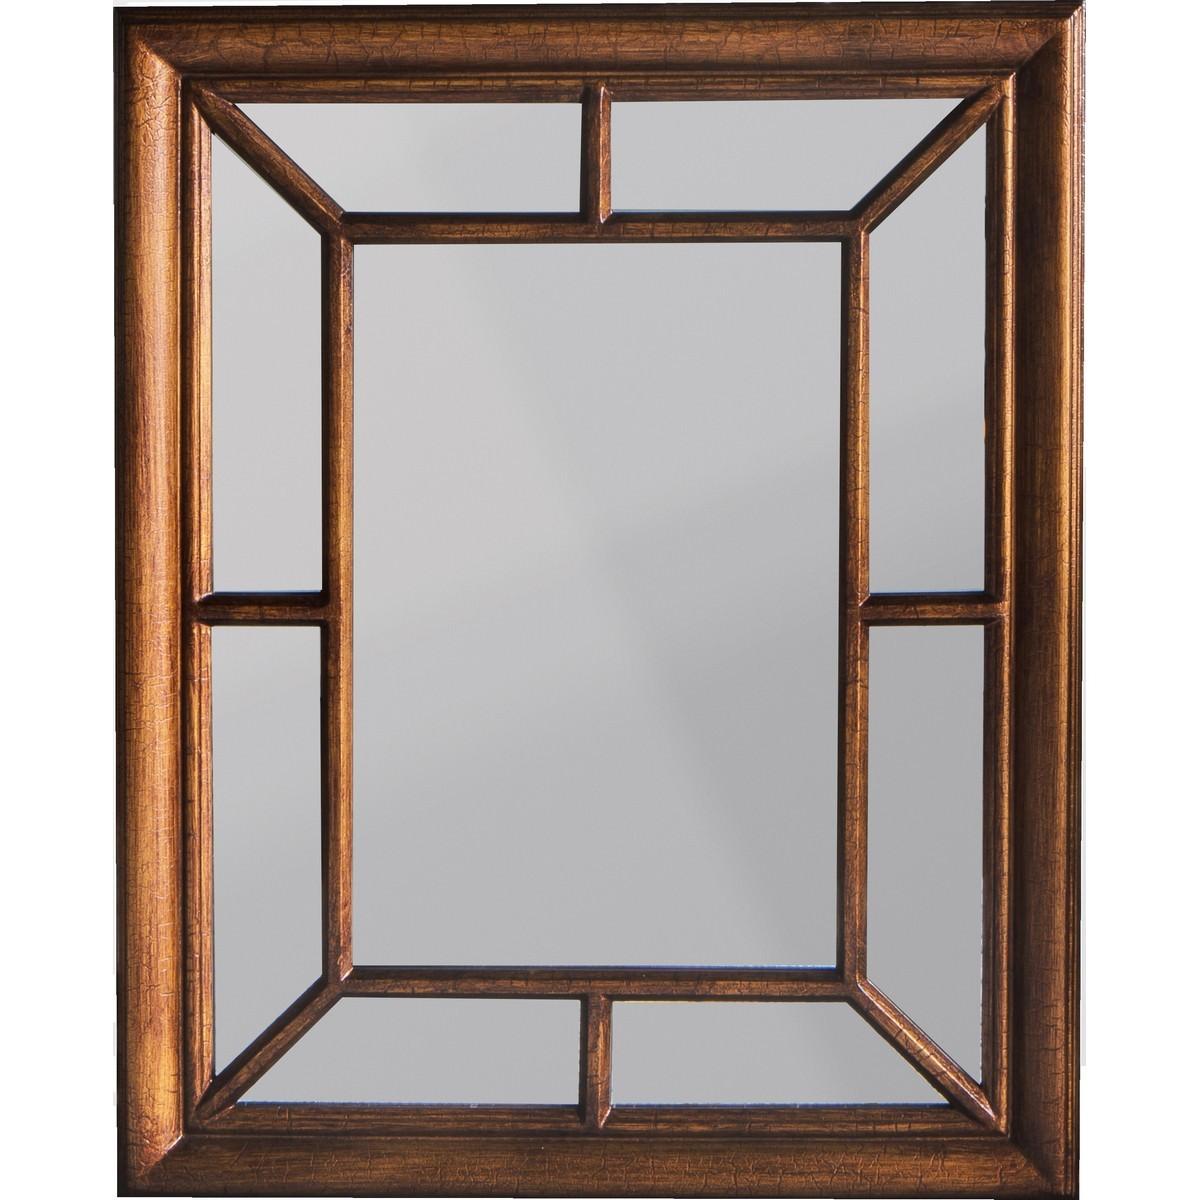 Chisholm Wooden Frame Wall Mirror, 87cm, Bronze